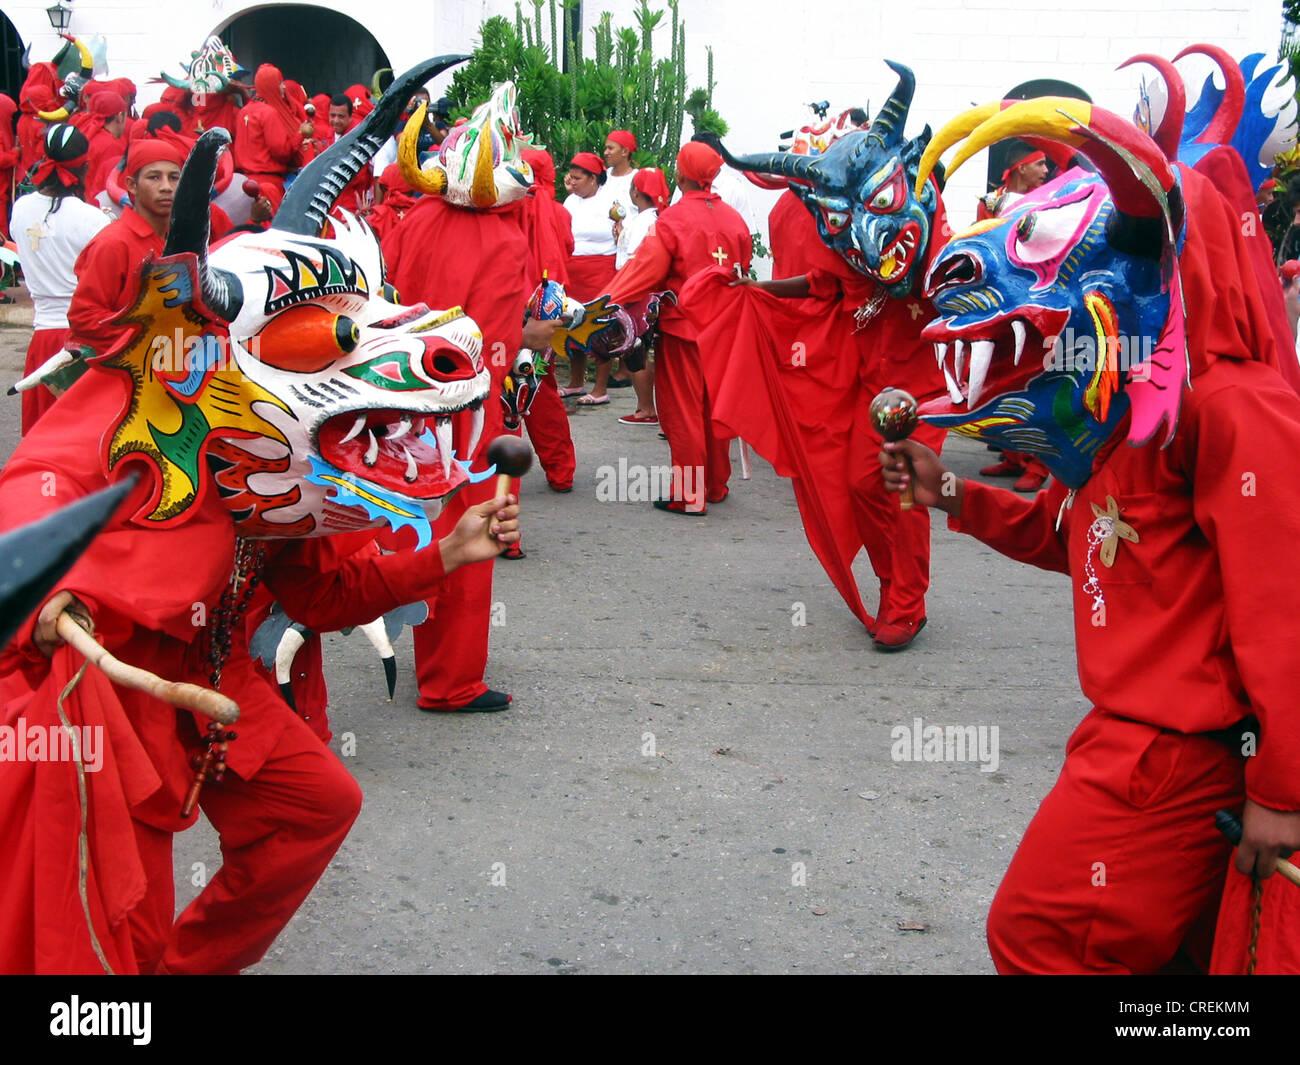 venezuelas culture essay Culture essays venezuela essays - yanomamo: people of the rainforest.